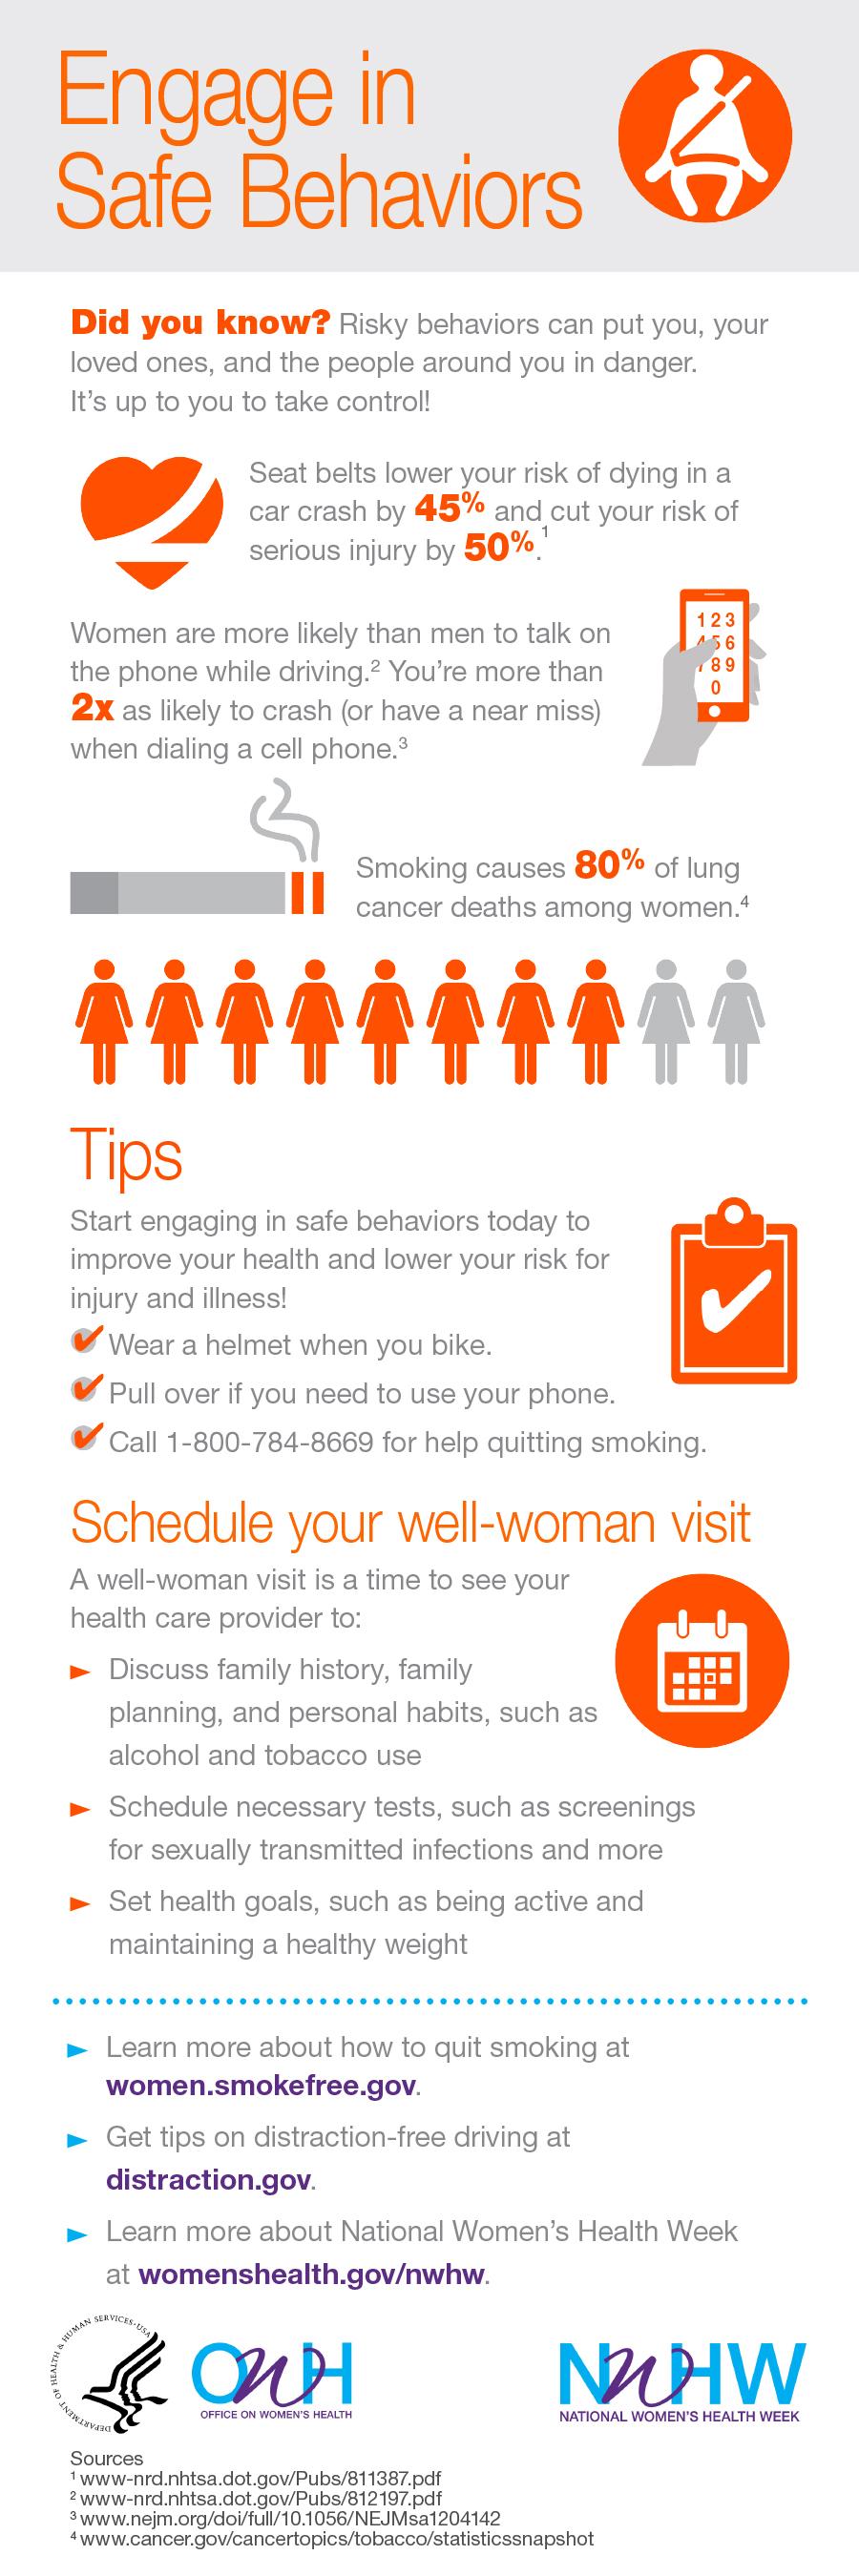 nwhw_infographic-safe-behaviors_0.jpg